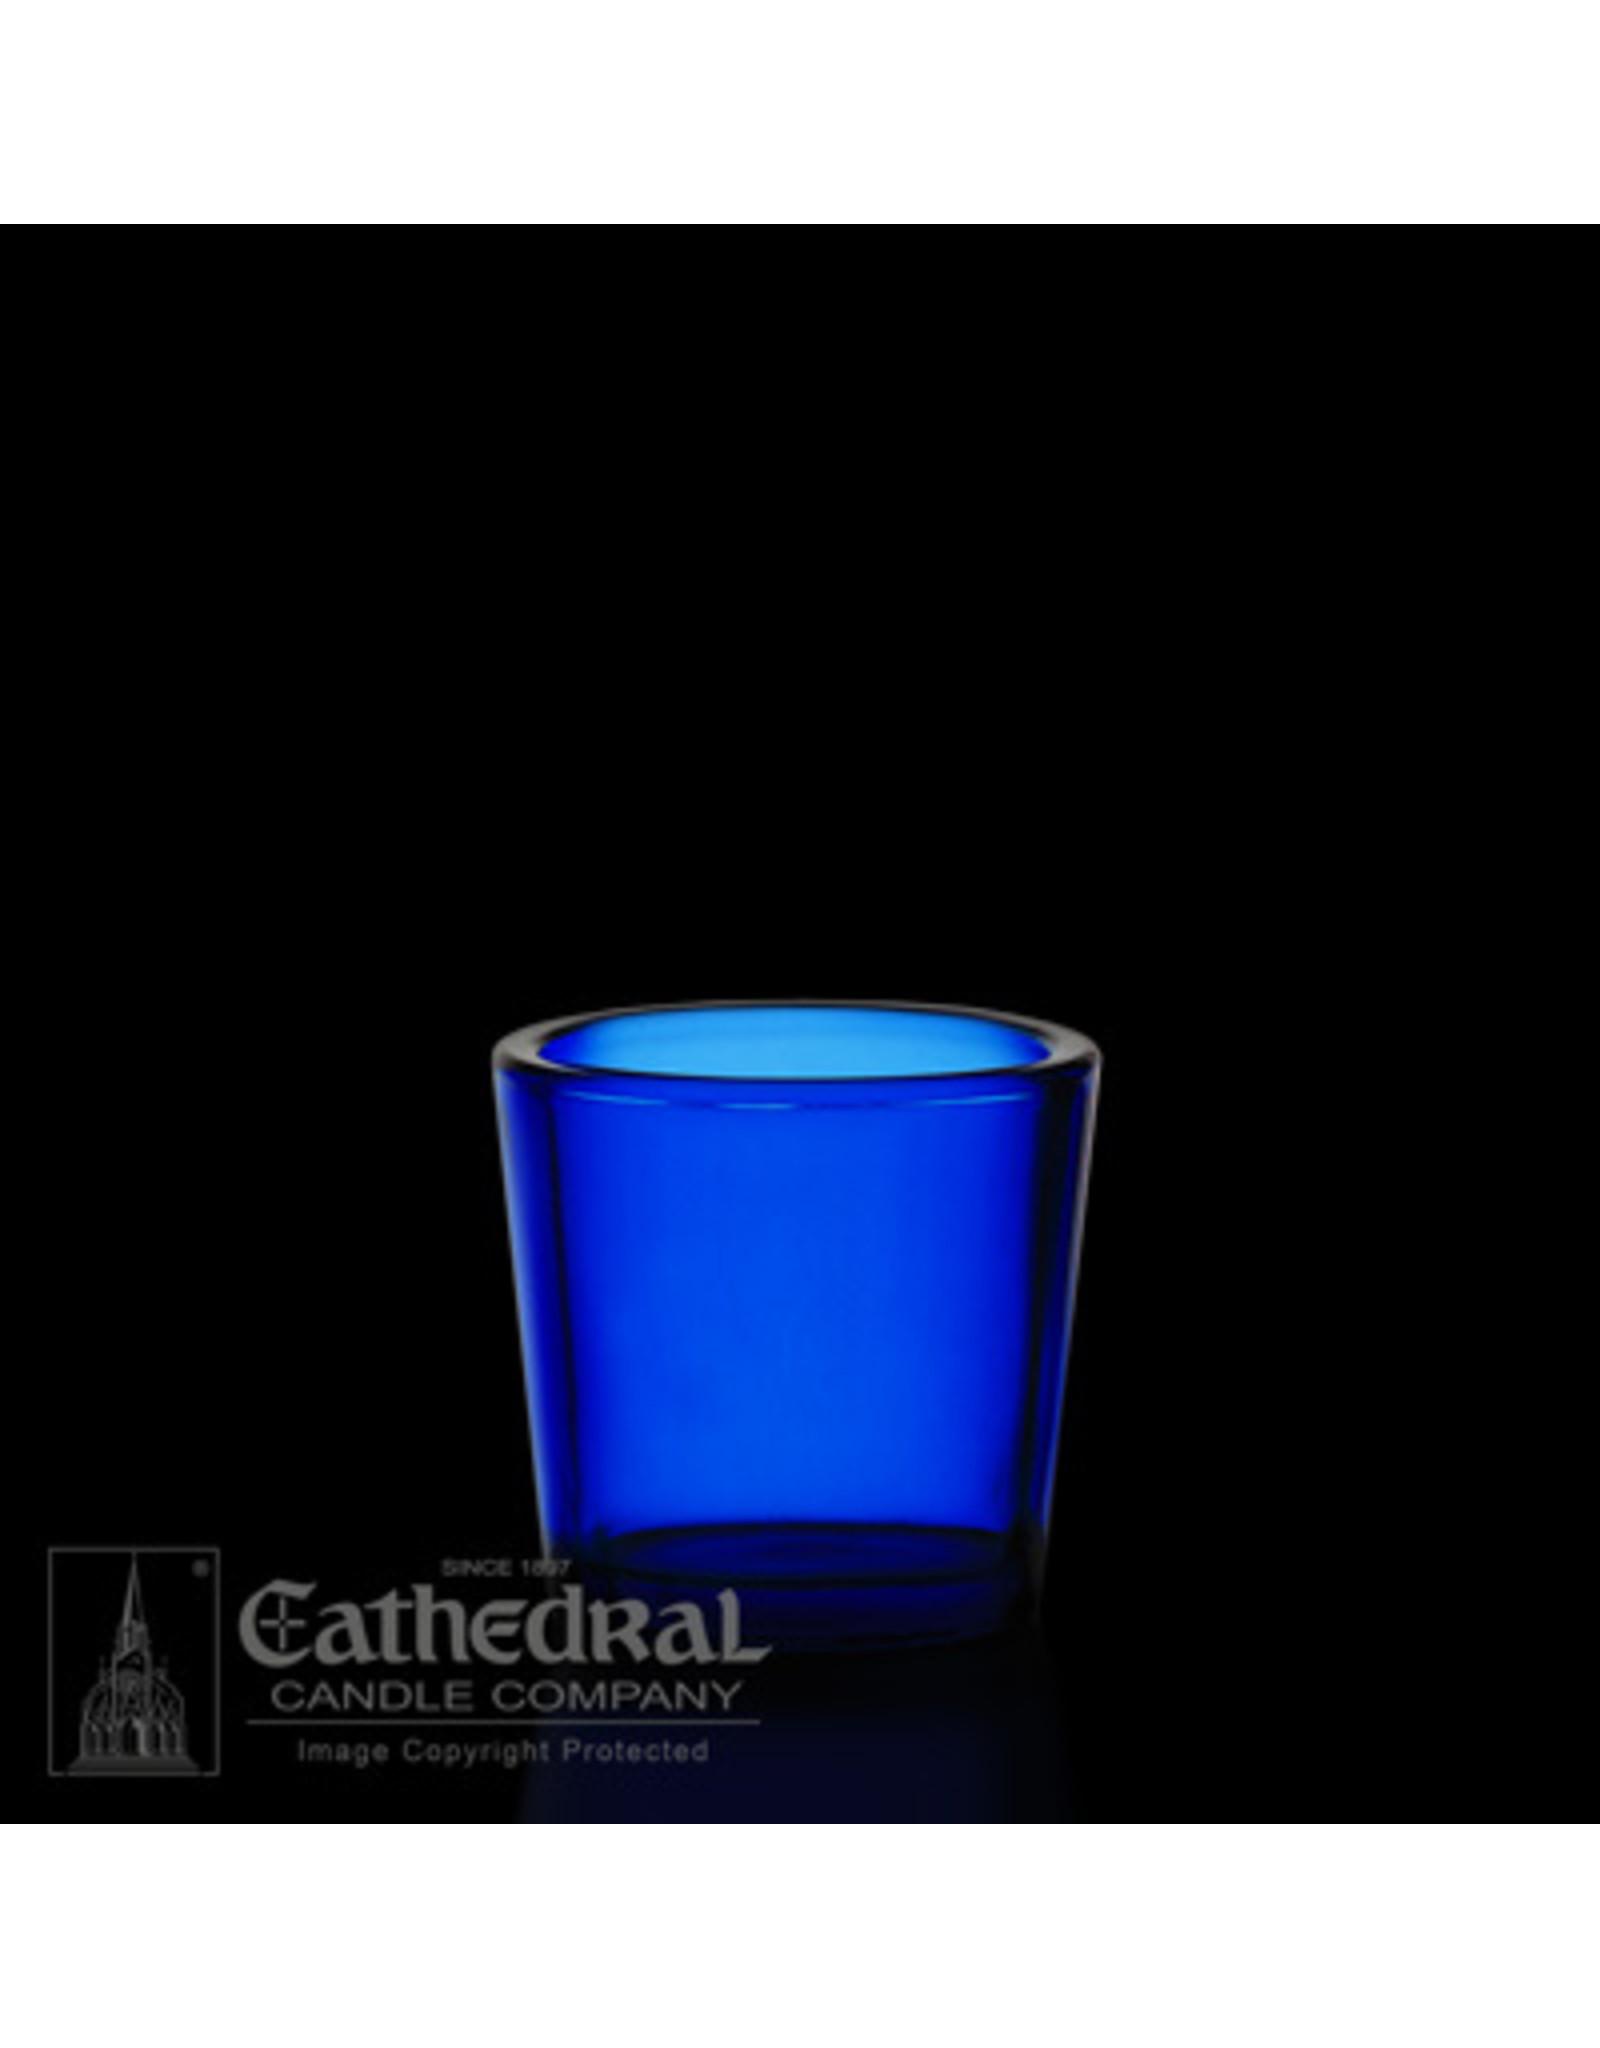 CNDL GLASS VOT 10 HR BLUE (12)